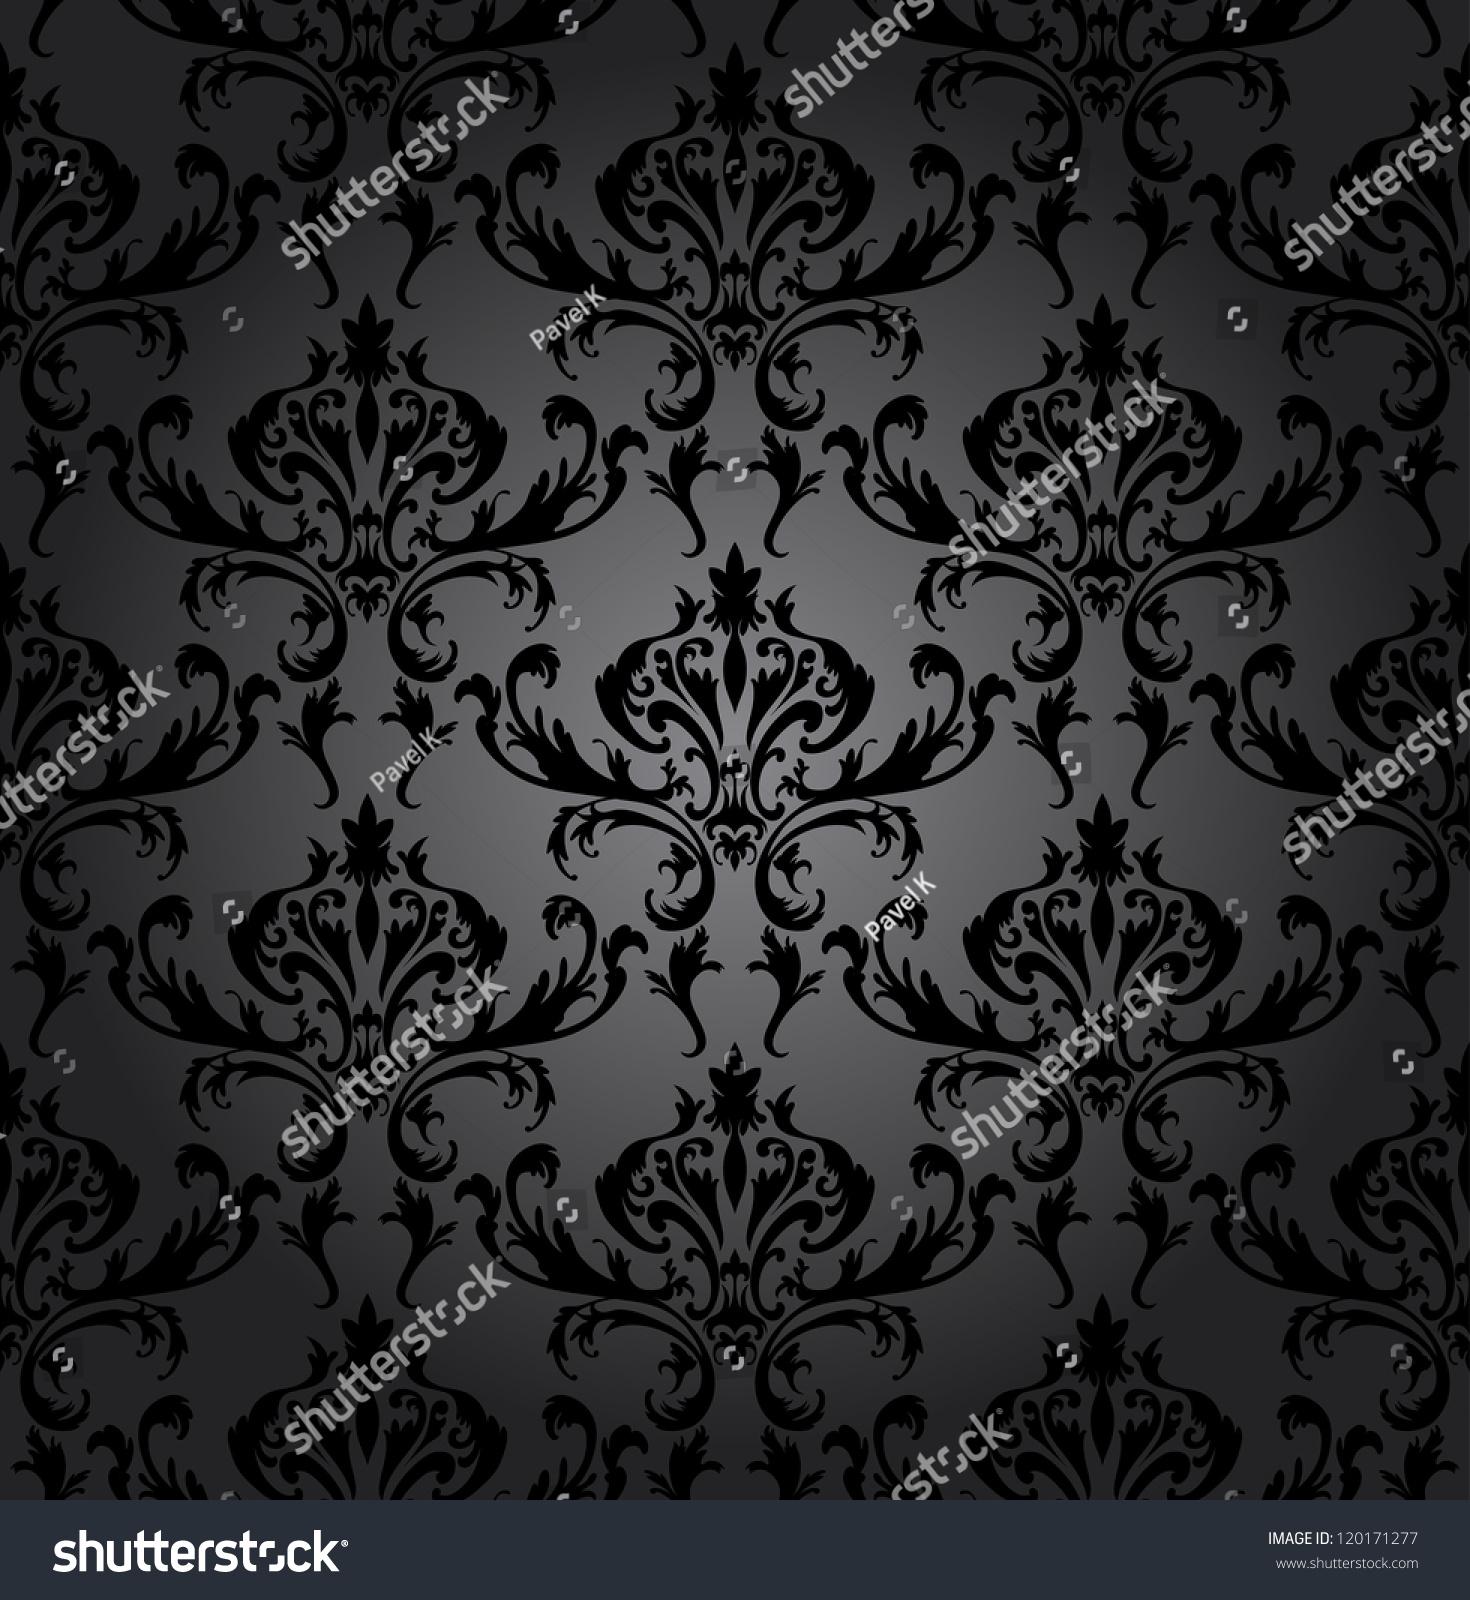 swirling royal pattern wallpaper - photo #27